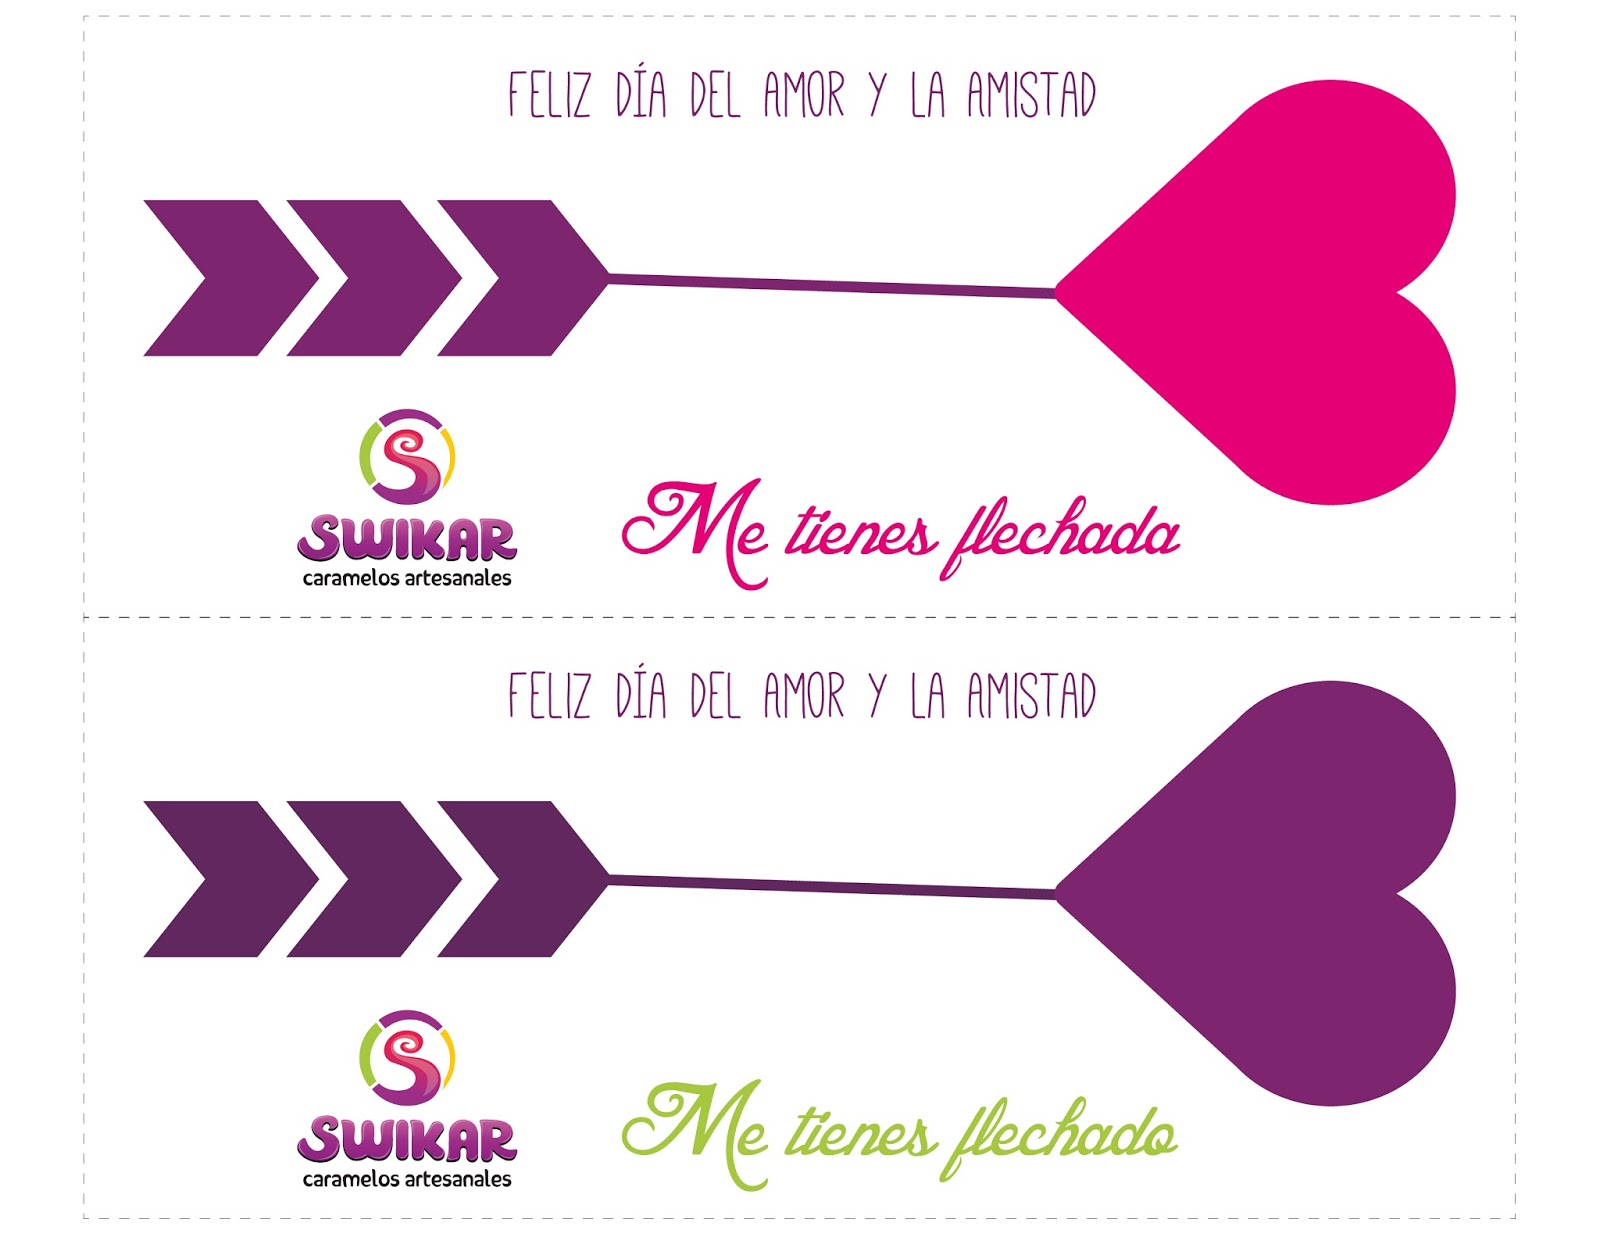 Swikar Candy: agosto 2015